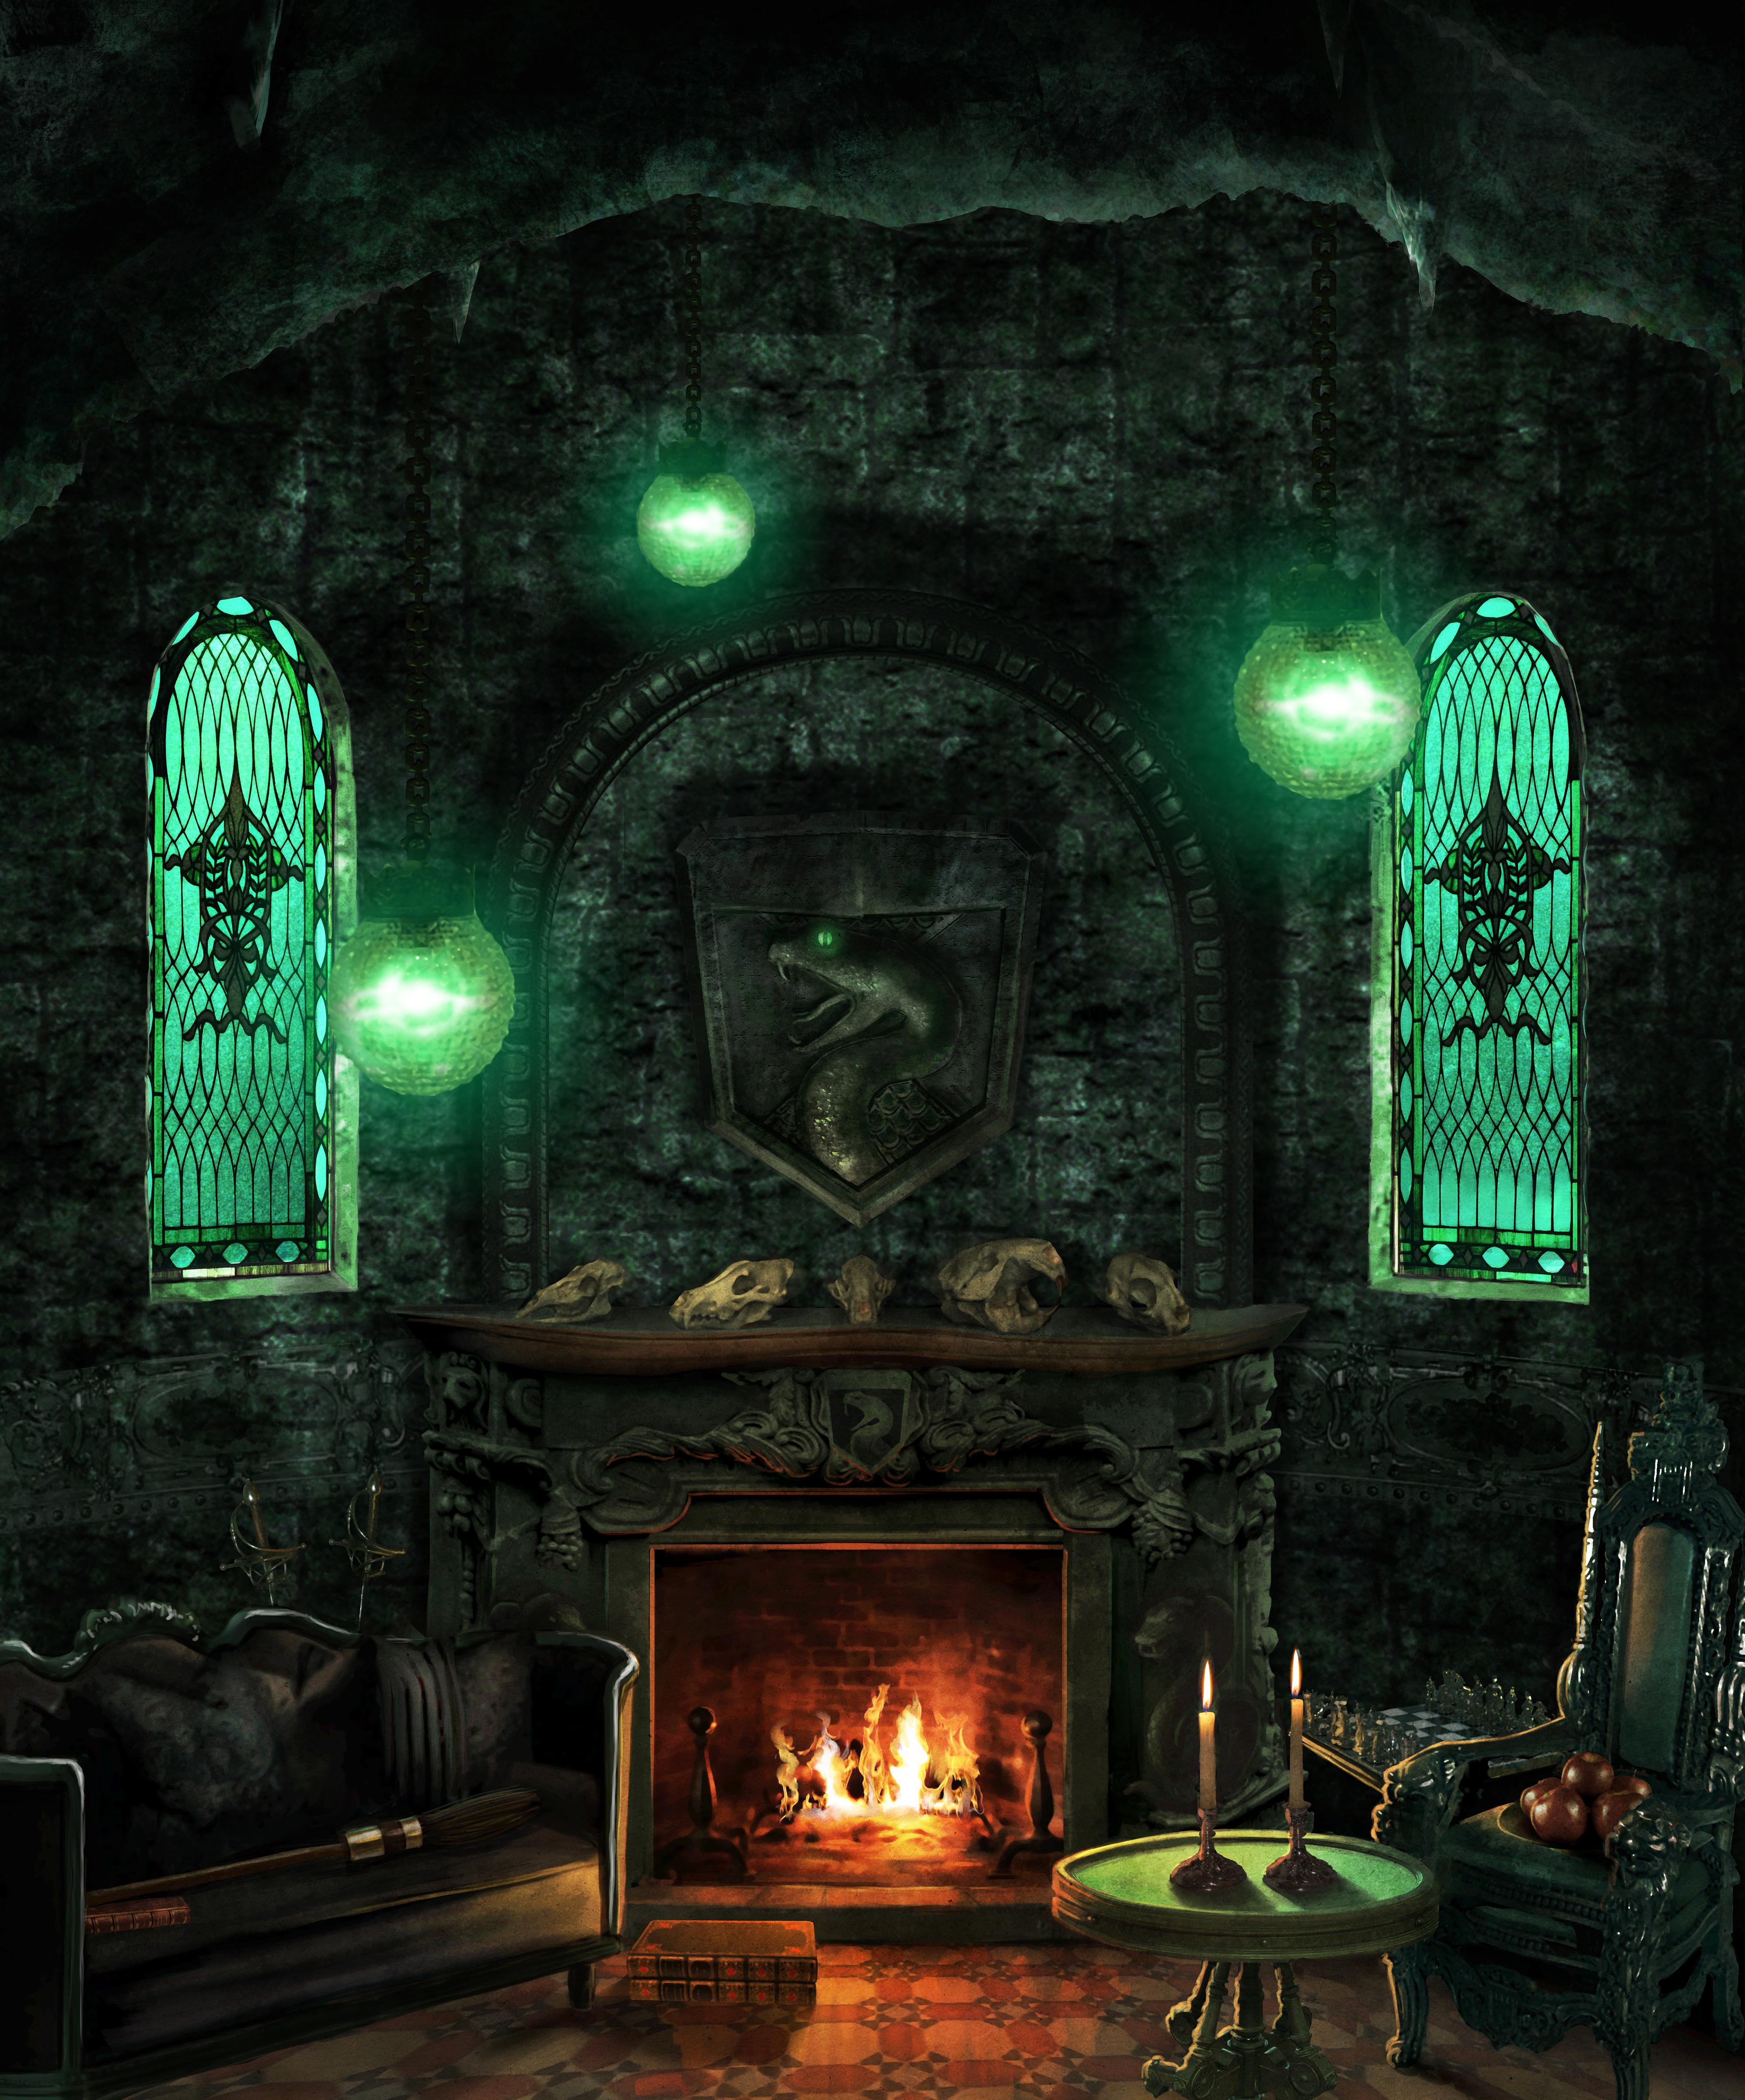 Slytherin VANS | Slytherin Common Room in 2019 | Slytherin